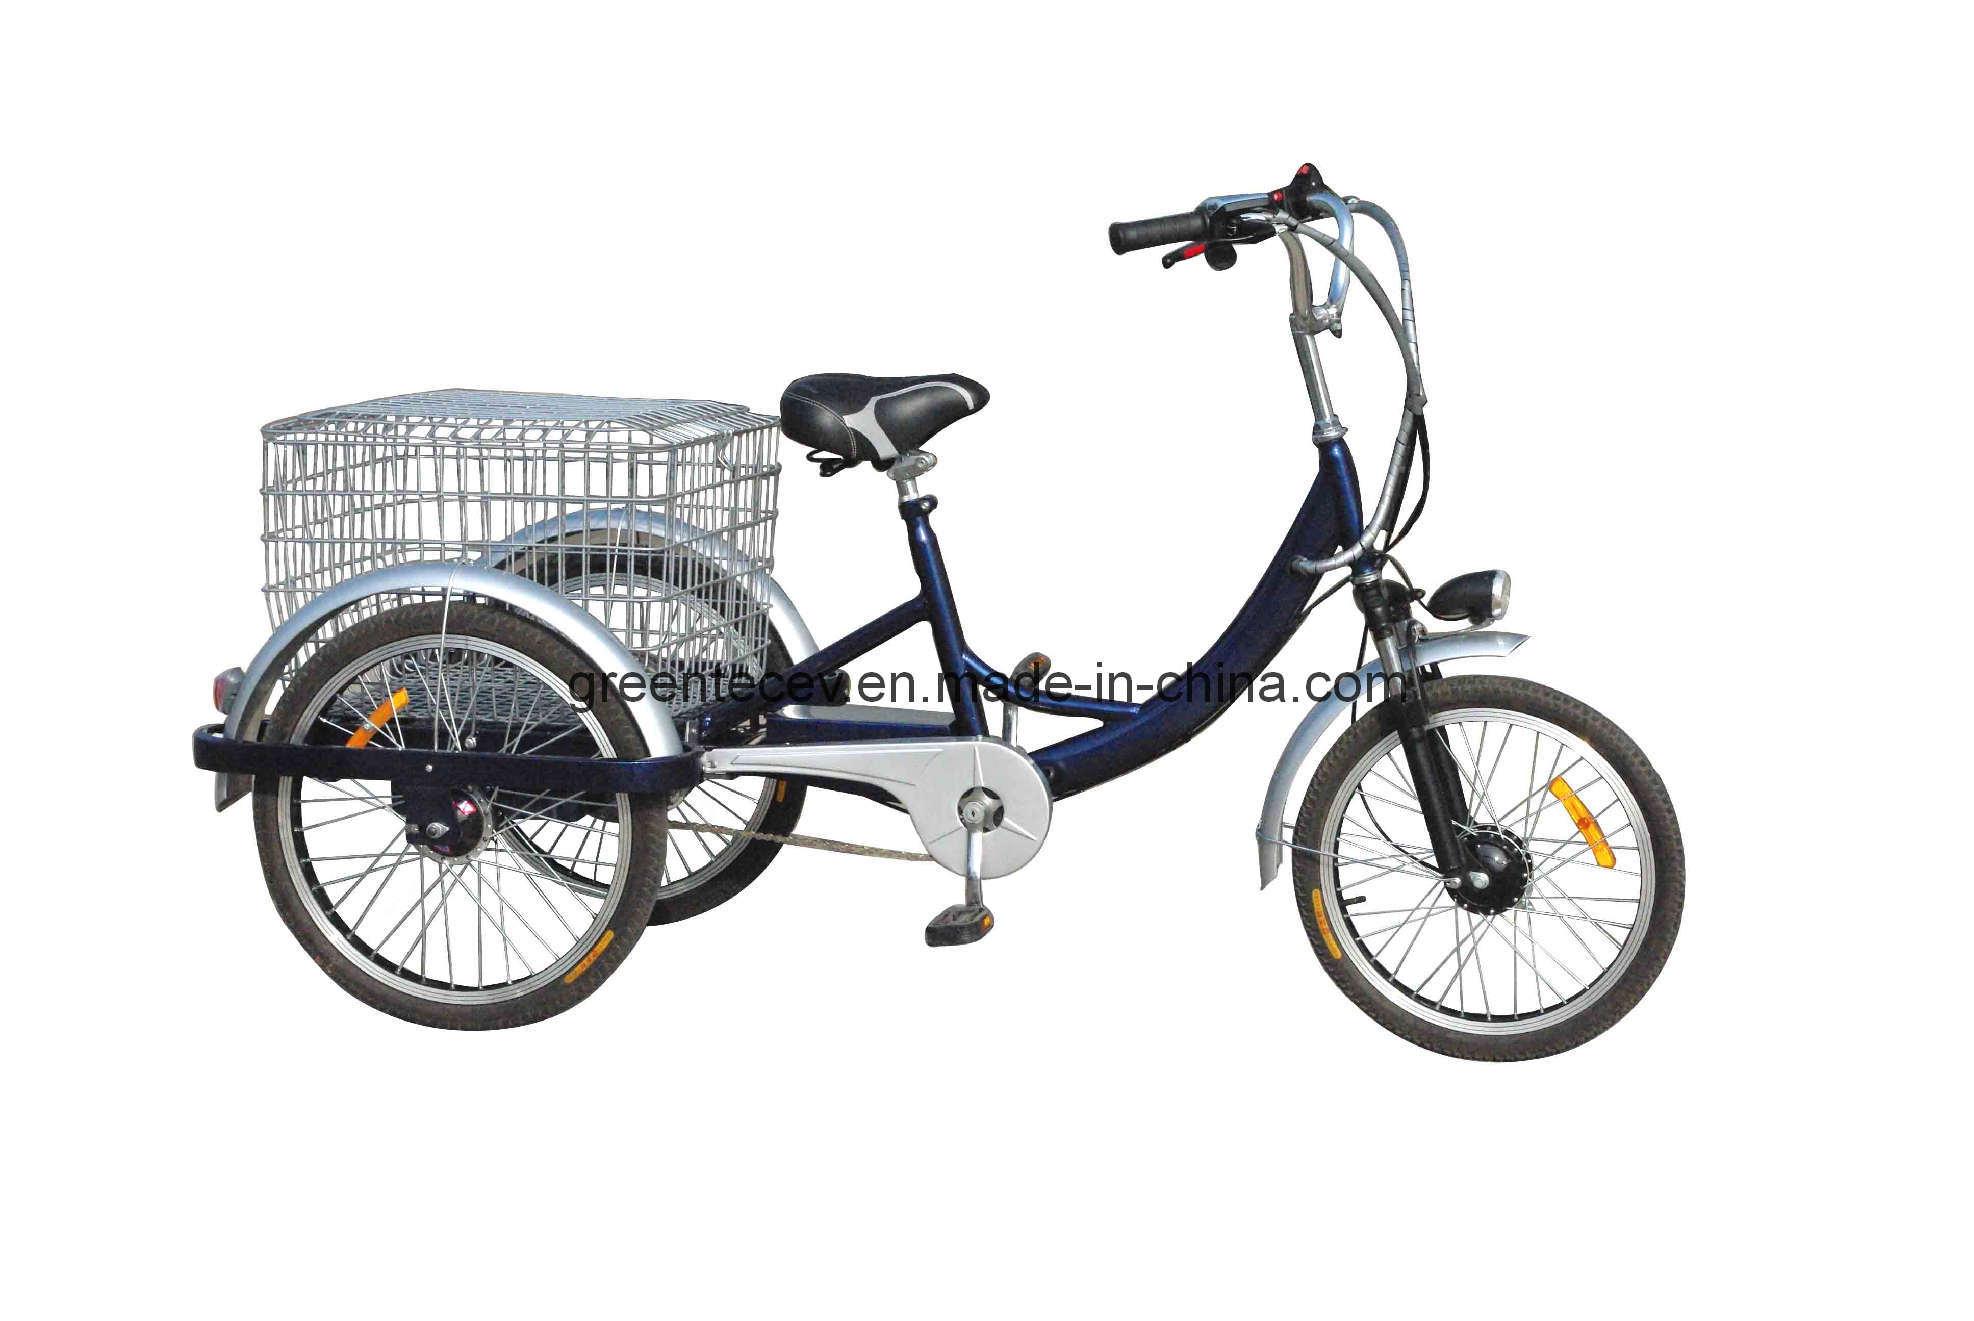 China Electric Tricycle/ Electric Trike/ Three Wheel